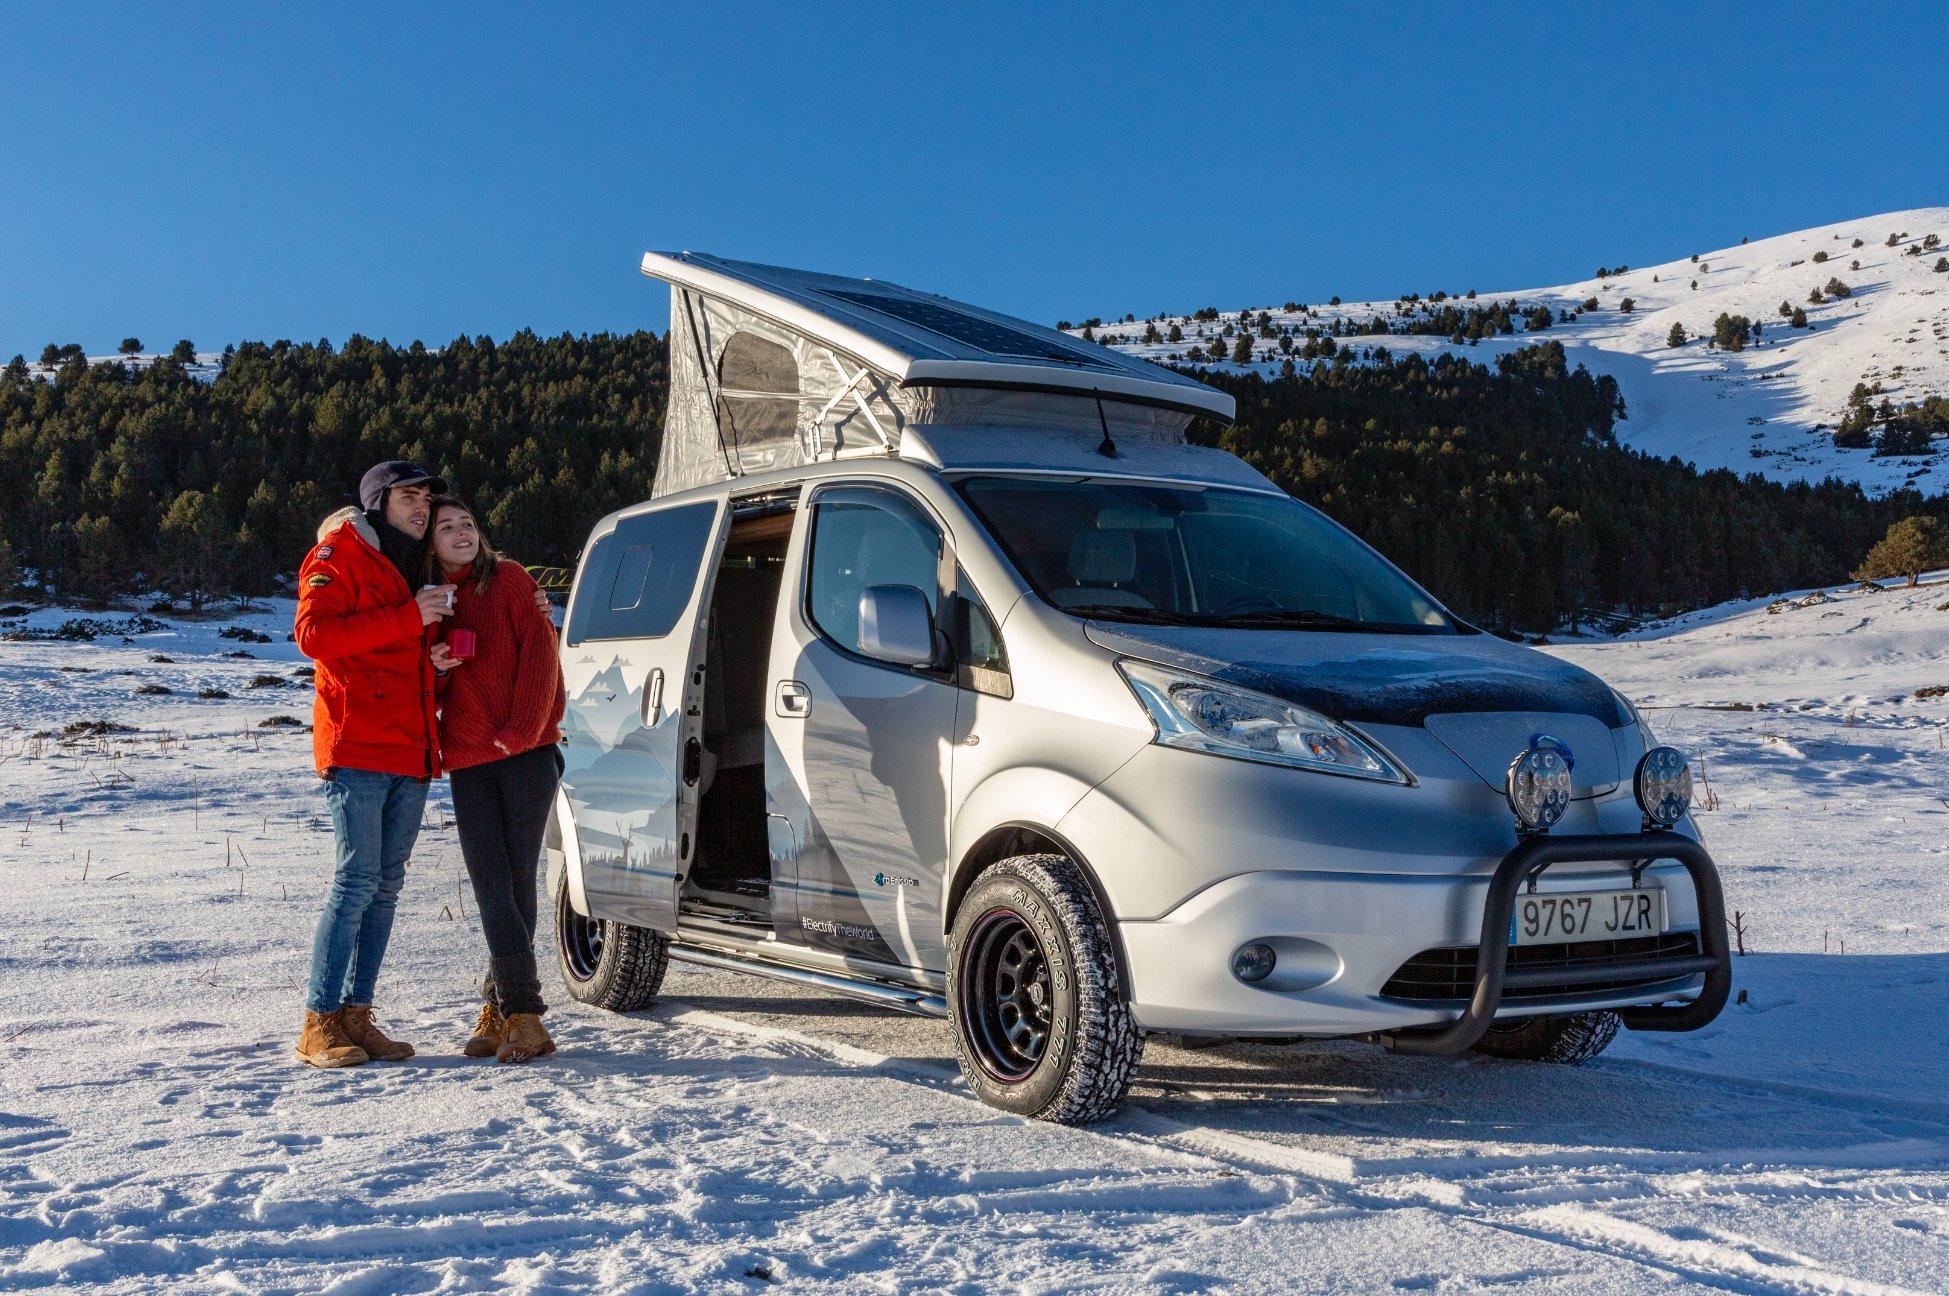 Nissan's electric camper van is the stuff of dreams